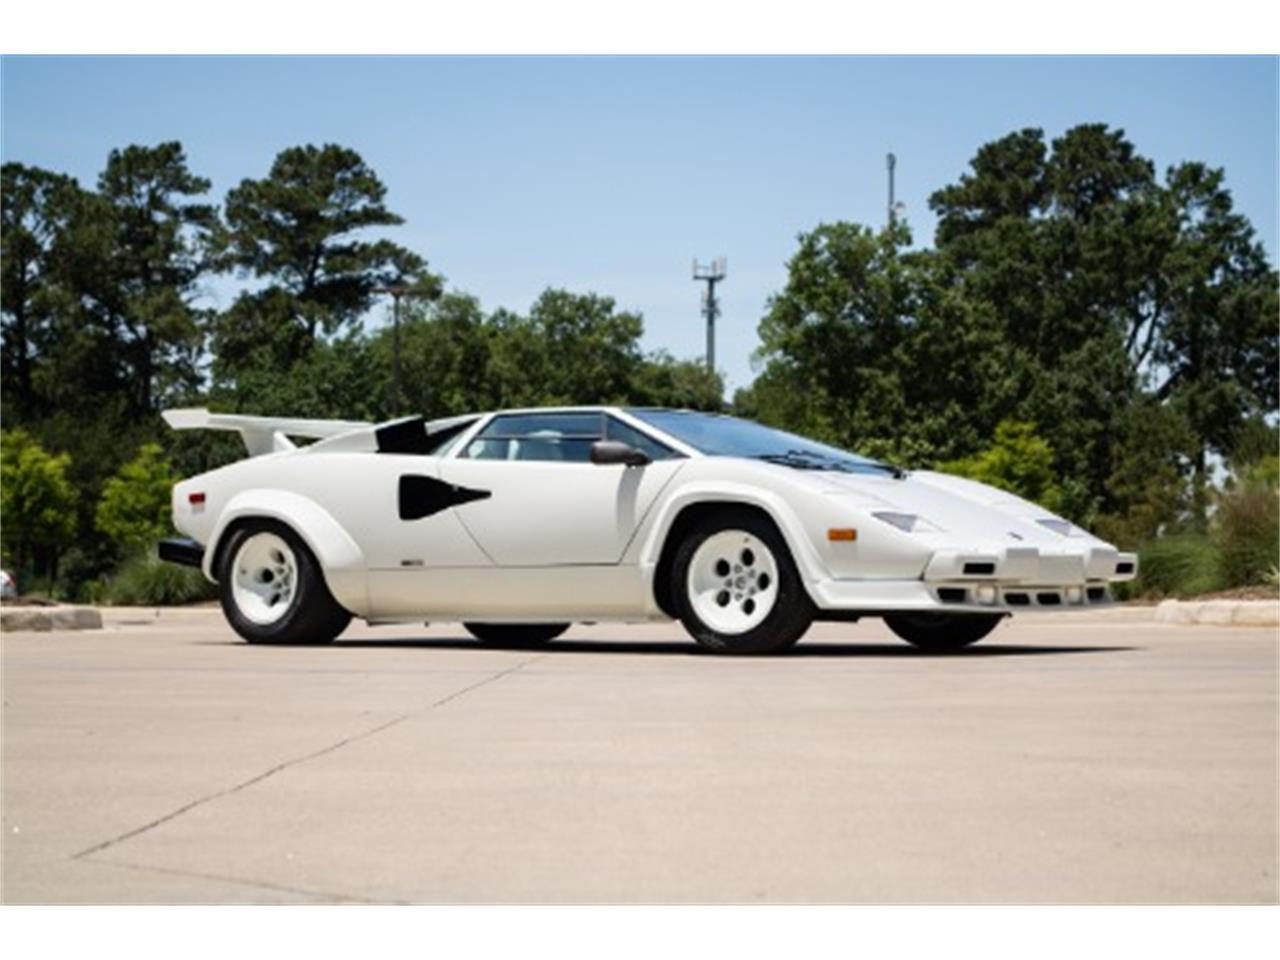 1987 Lamborghini Countach For Sale Classiccars Com Cc 1091425